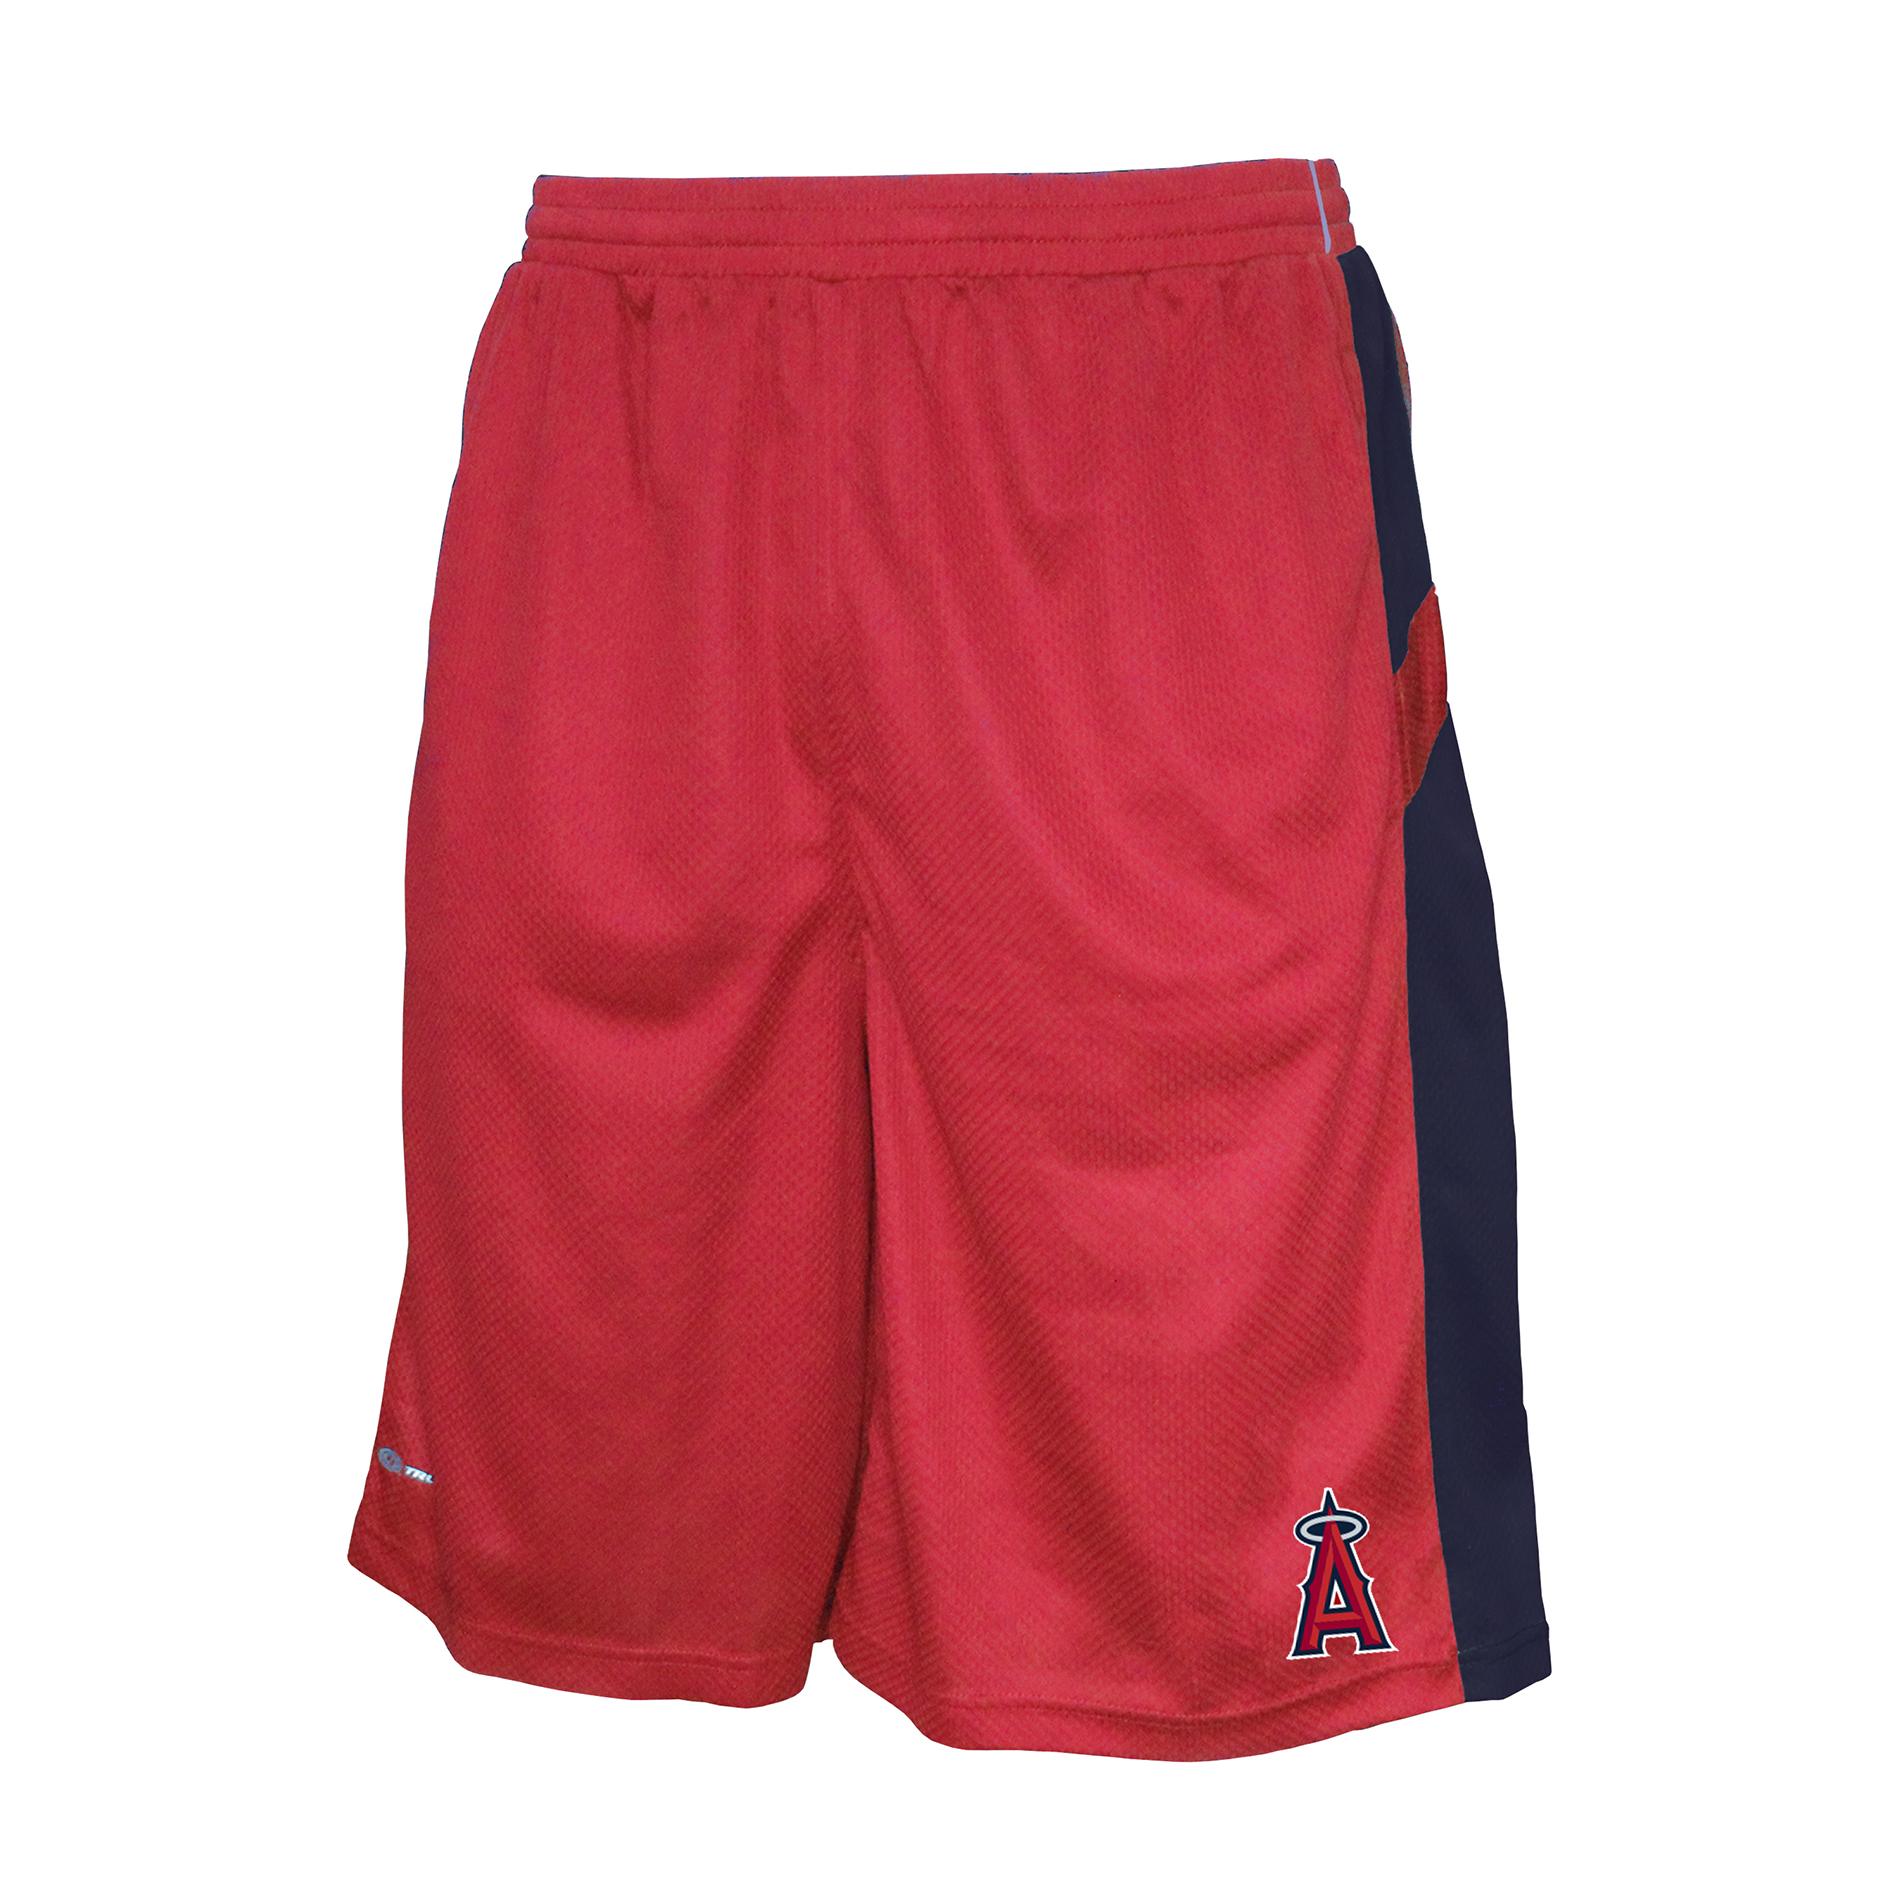 MLB Los Angeles Angels of Anaheim Mesh Shorts